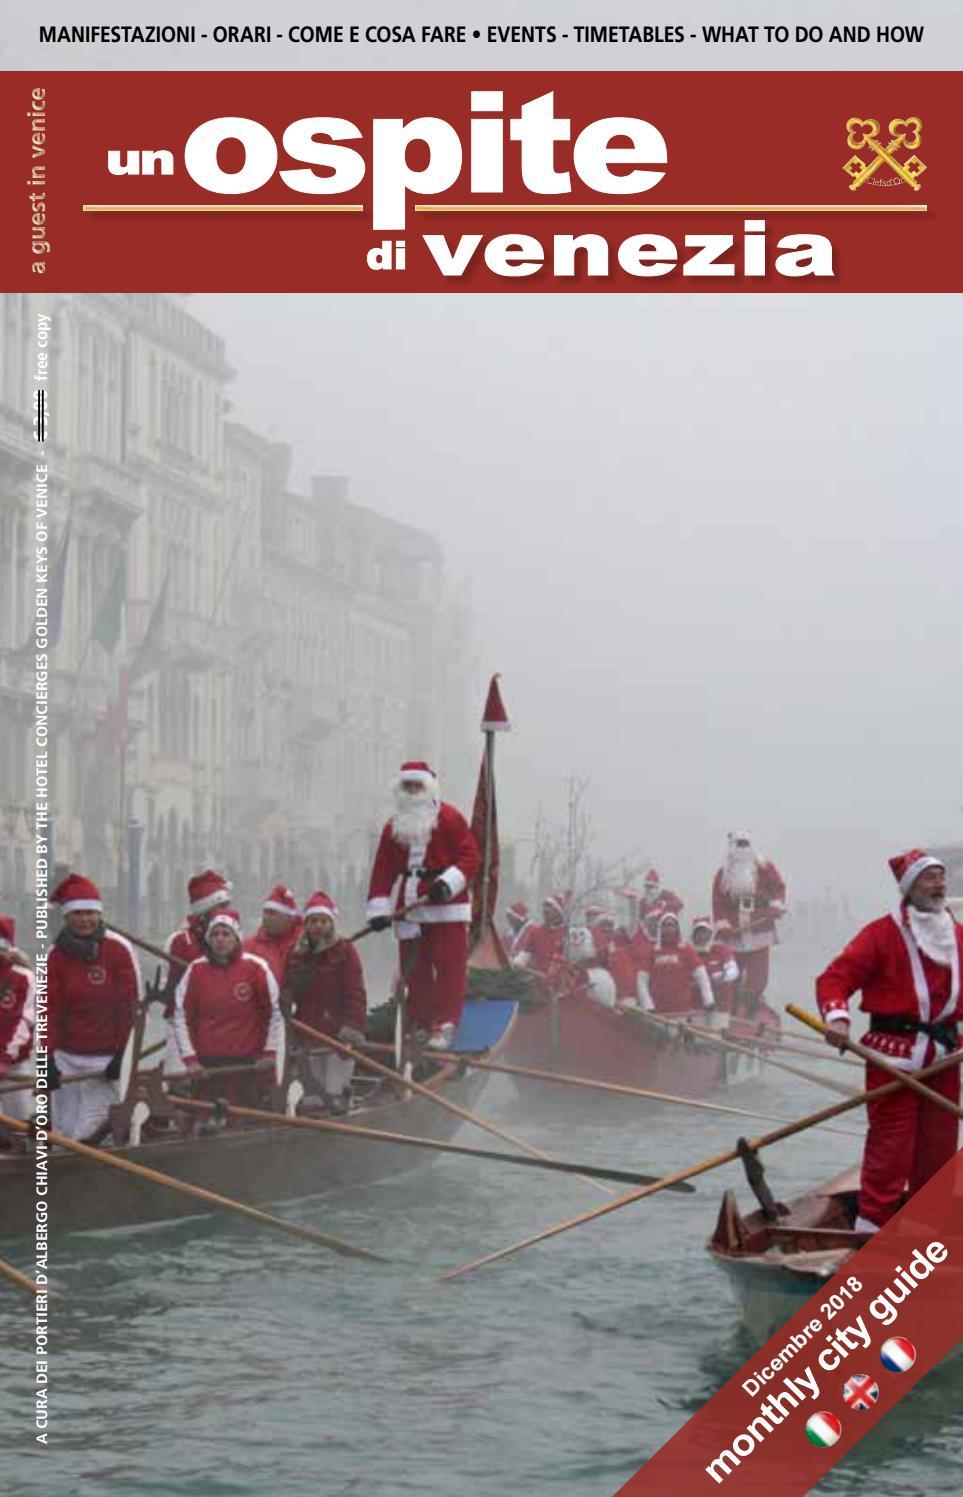 Atmosfere di Natale a Venezia | un Ospite di Venezia | 12